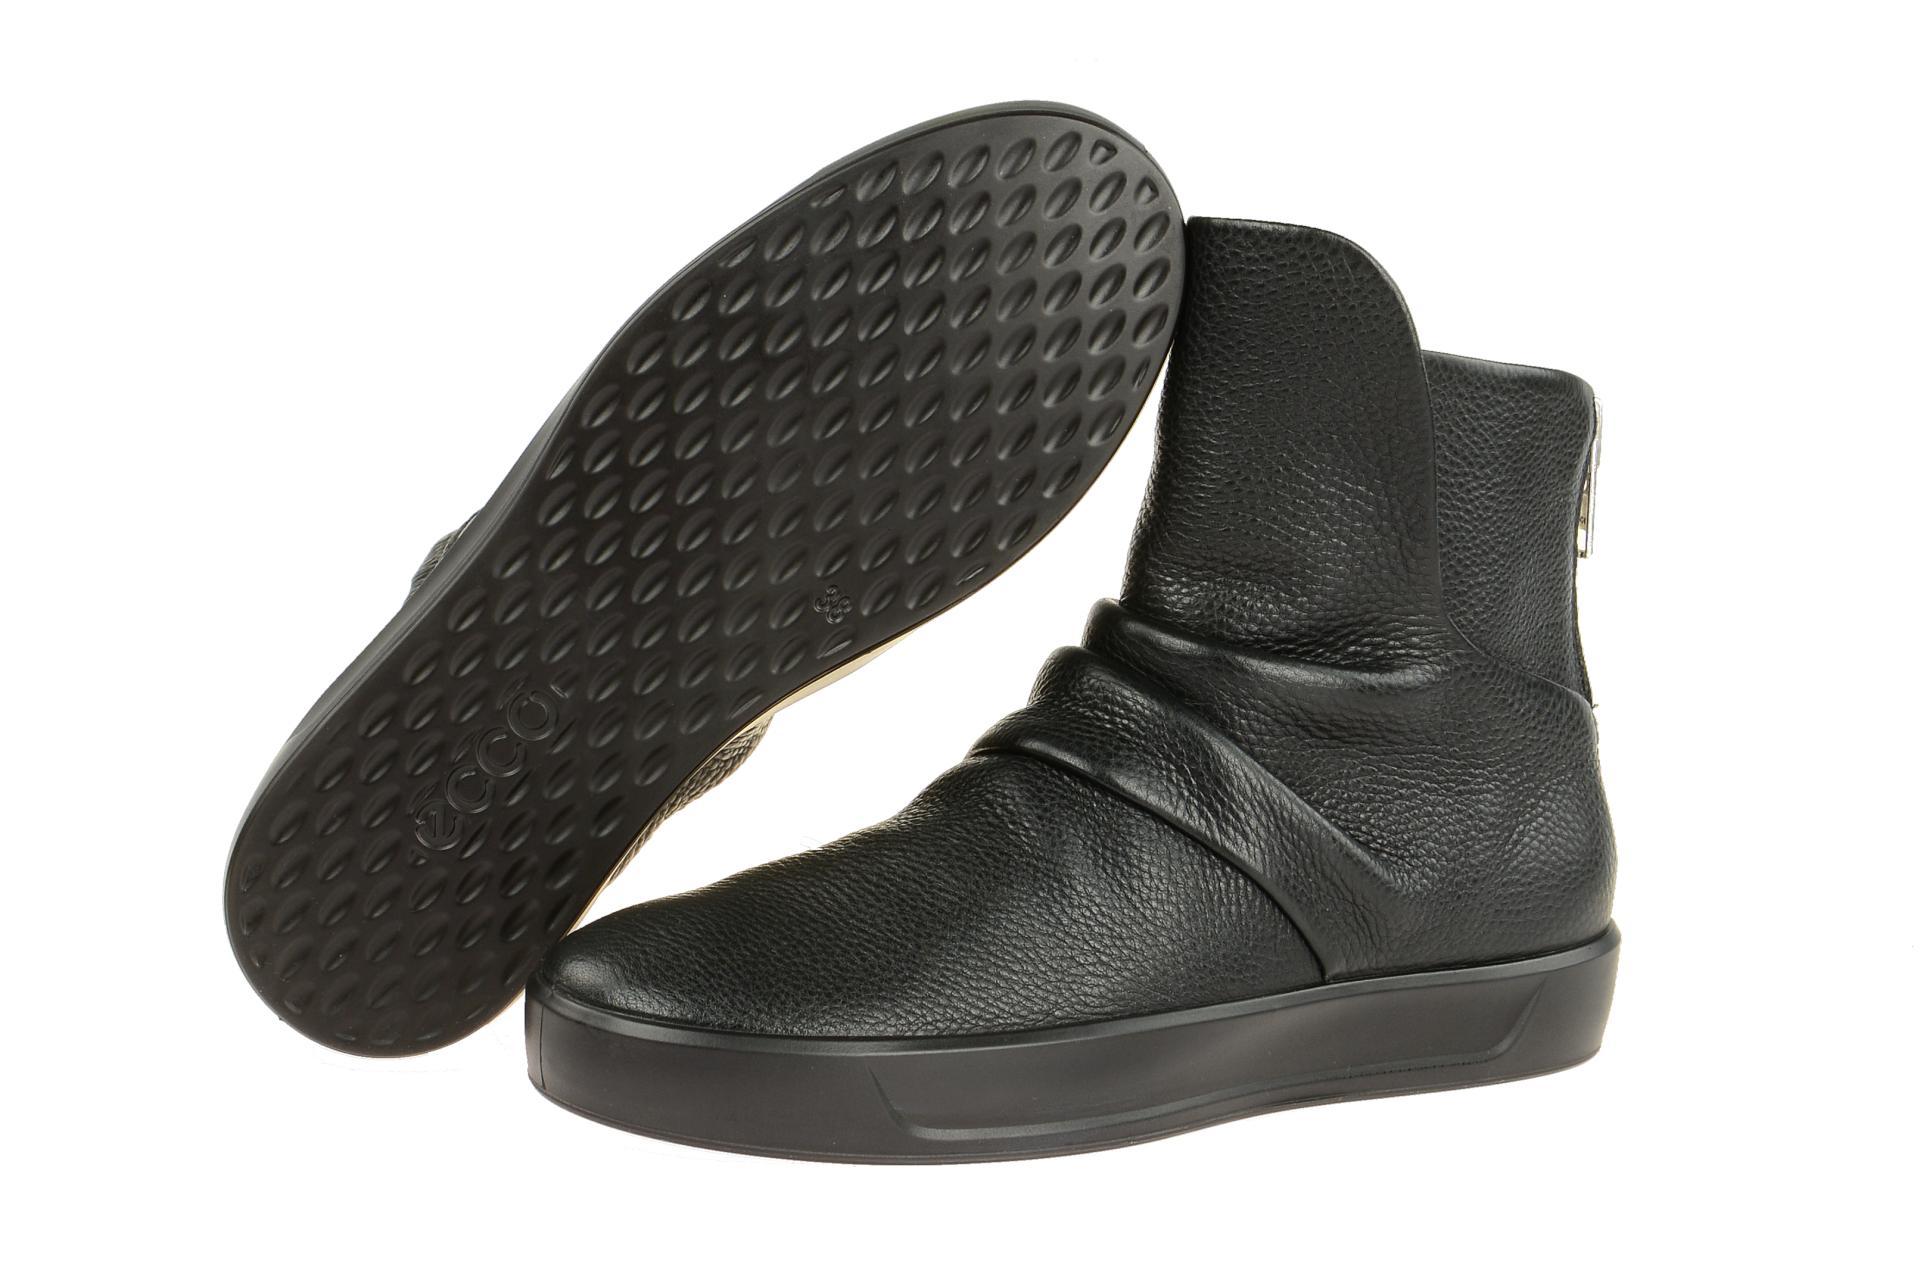 c903aca35f0cab Ecco Schuhe SOFT 8 LADIES schwarz Damen Stiefeletten 44056301001 NEU ...